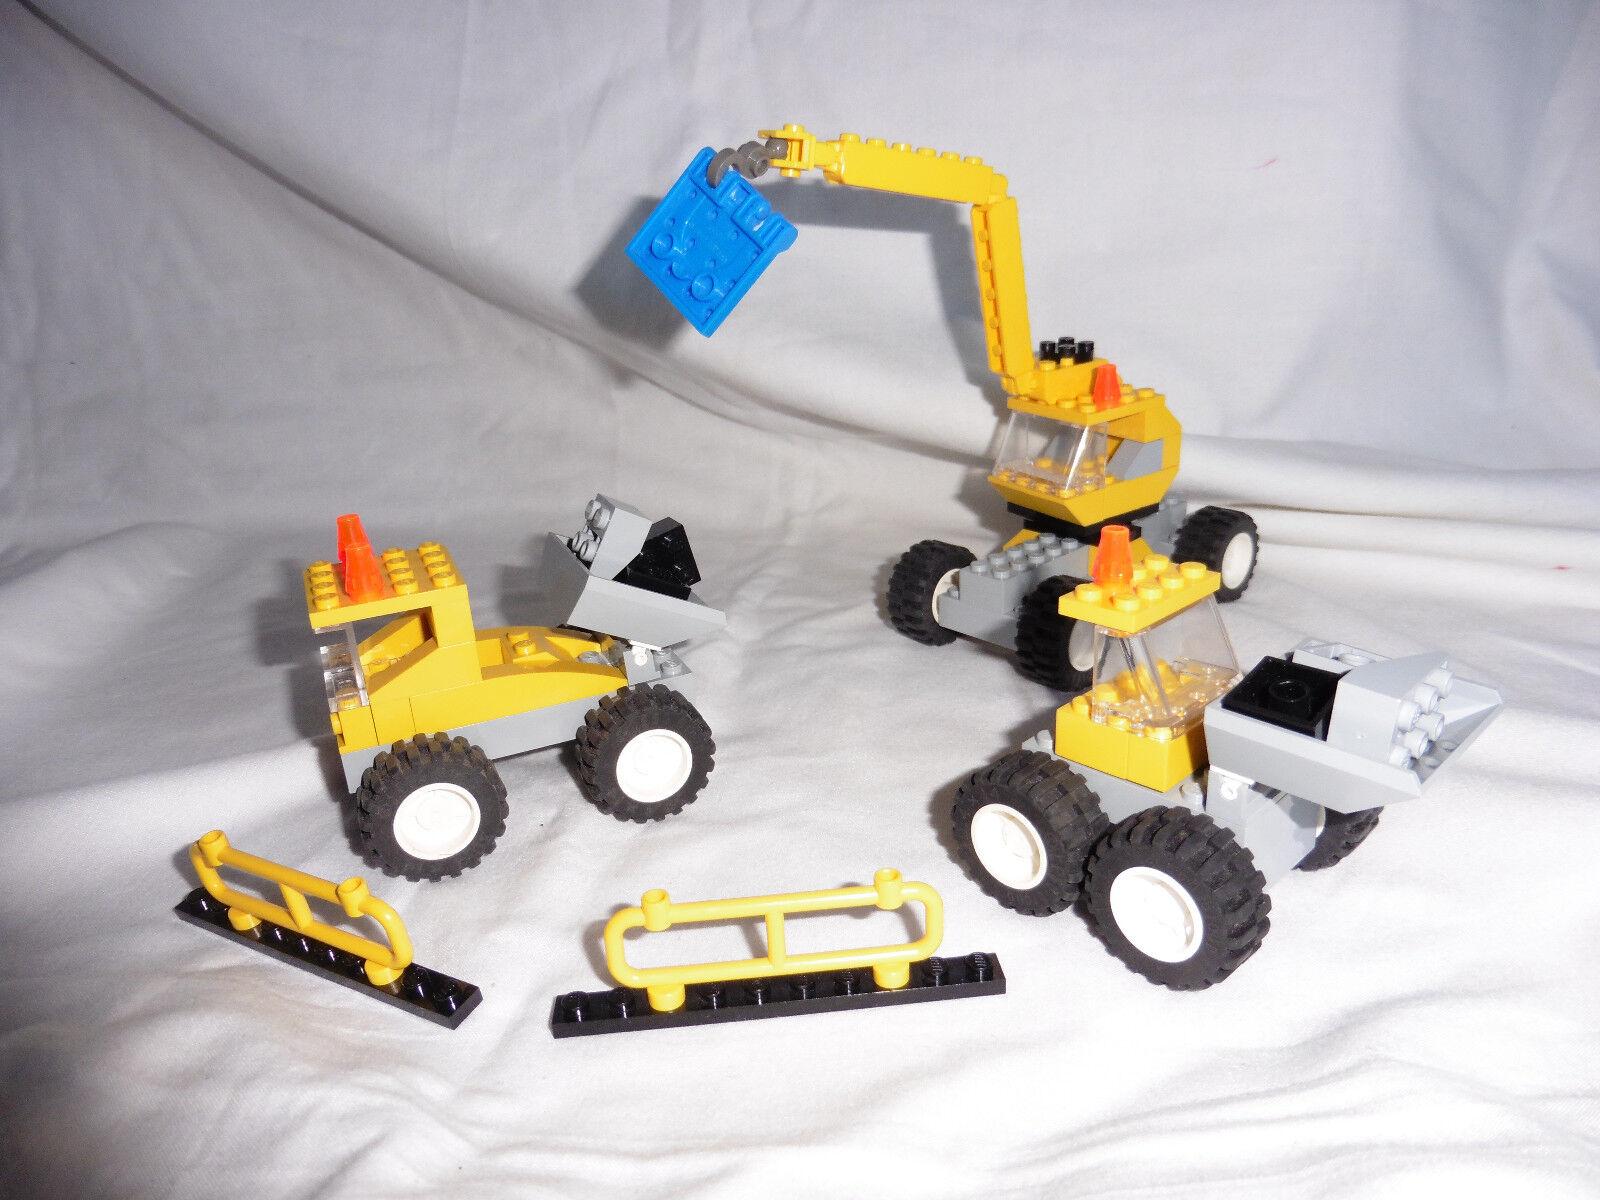 LEGO MAKE AND CREATE  CREATOR  4407  TRANSPORTATION  INSTRUCTIONS